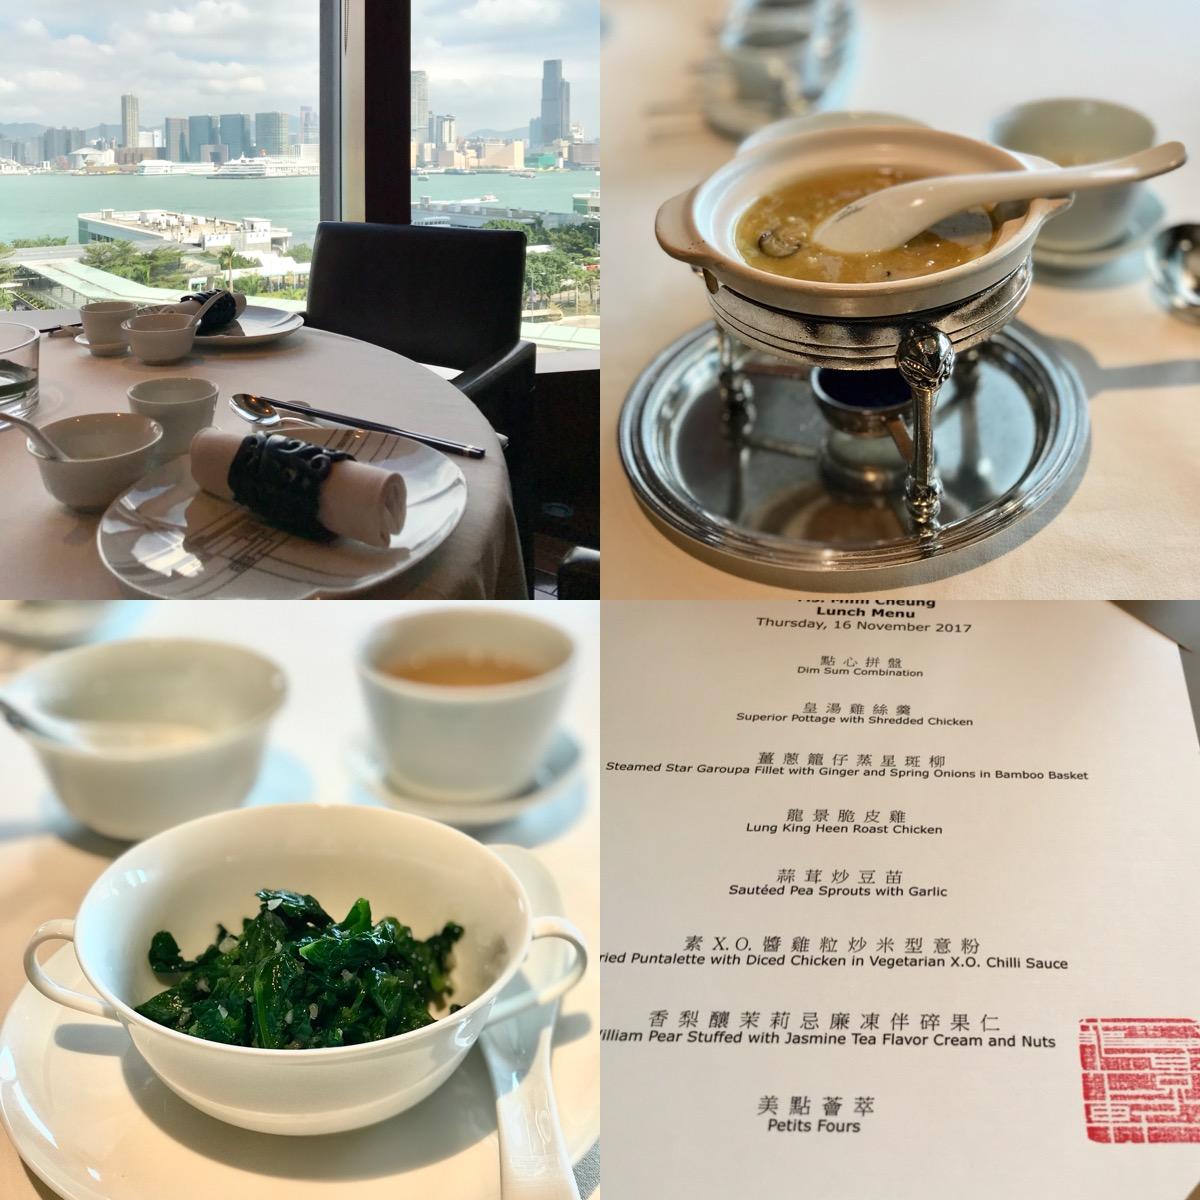 Hong Kong Lun King Heen